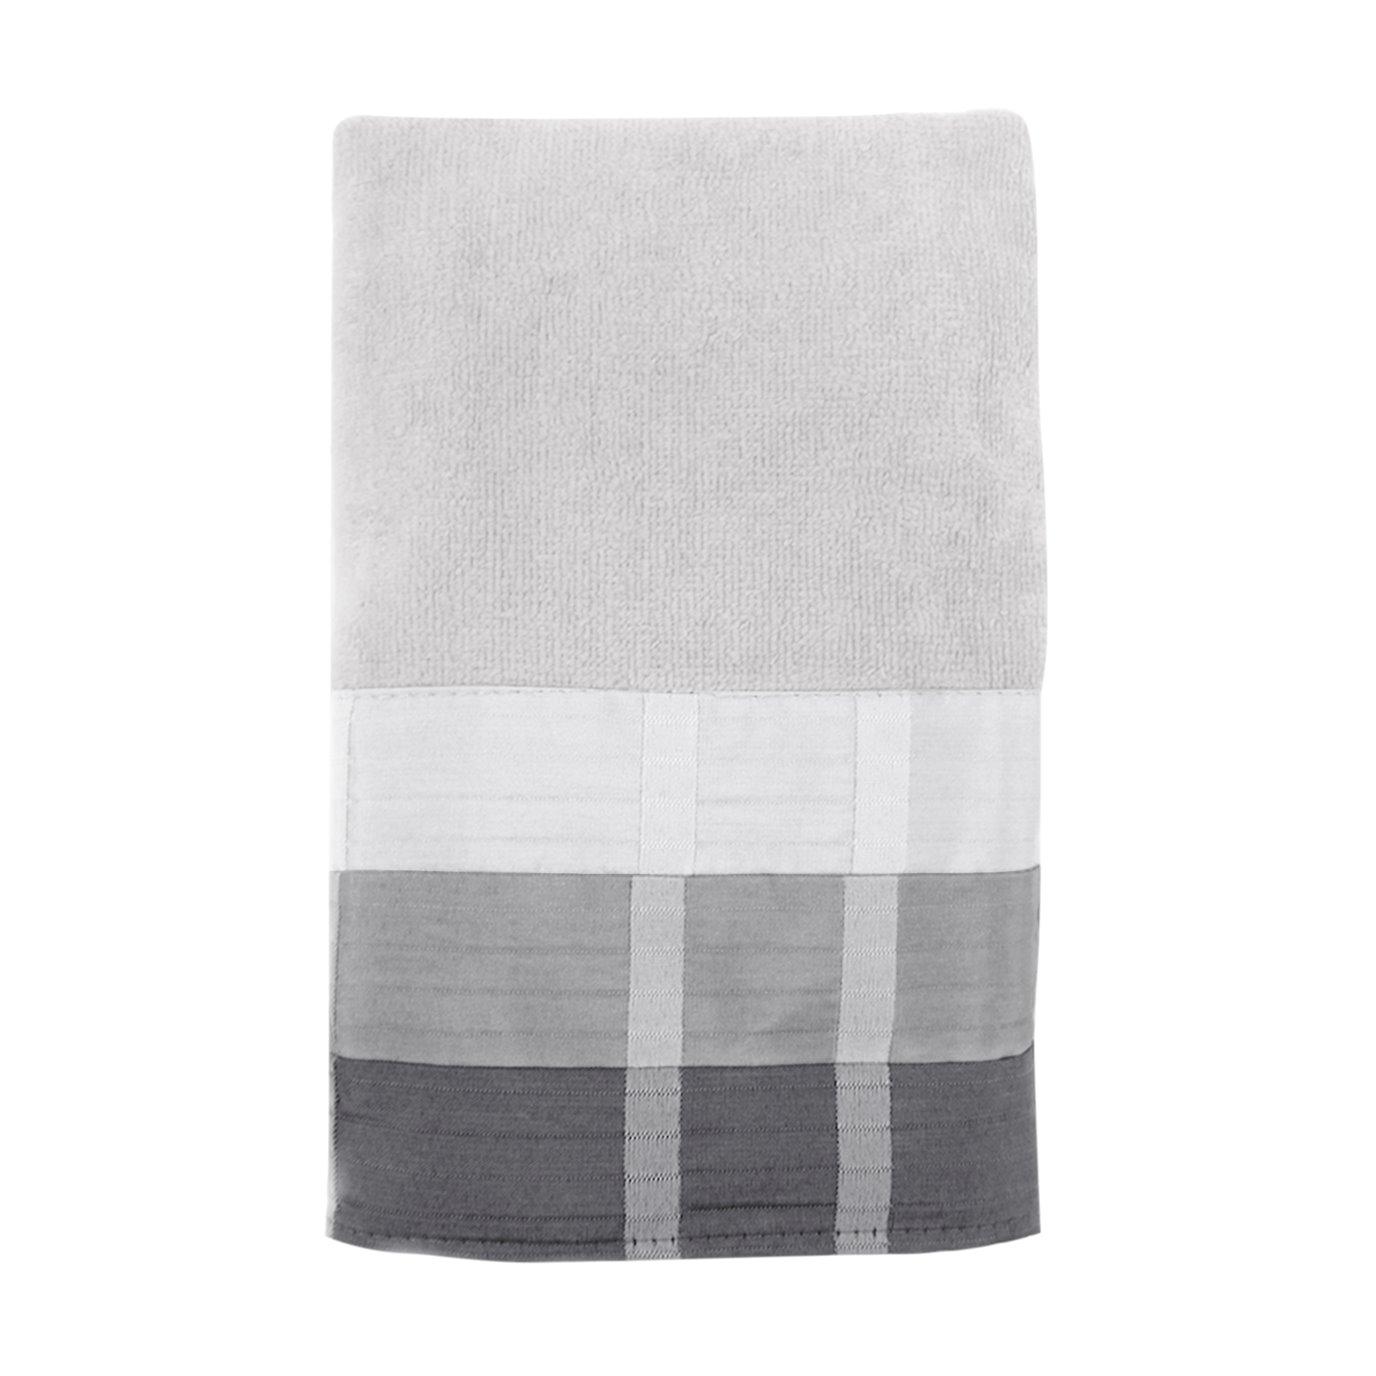 Fairfax Hand Towel Black 16X28